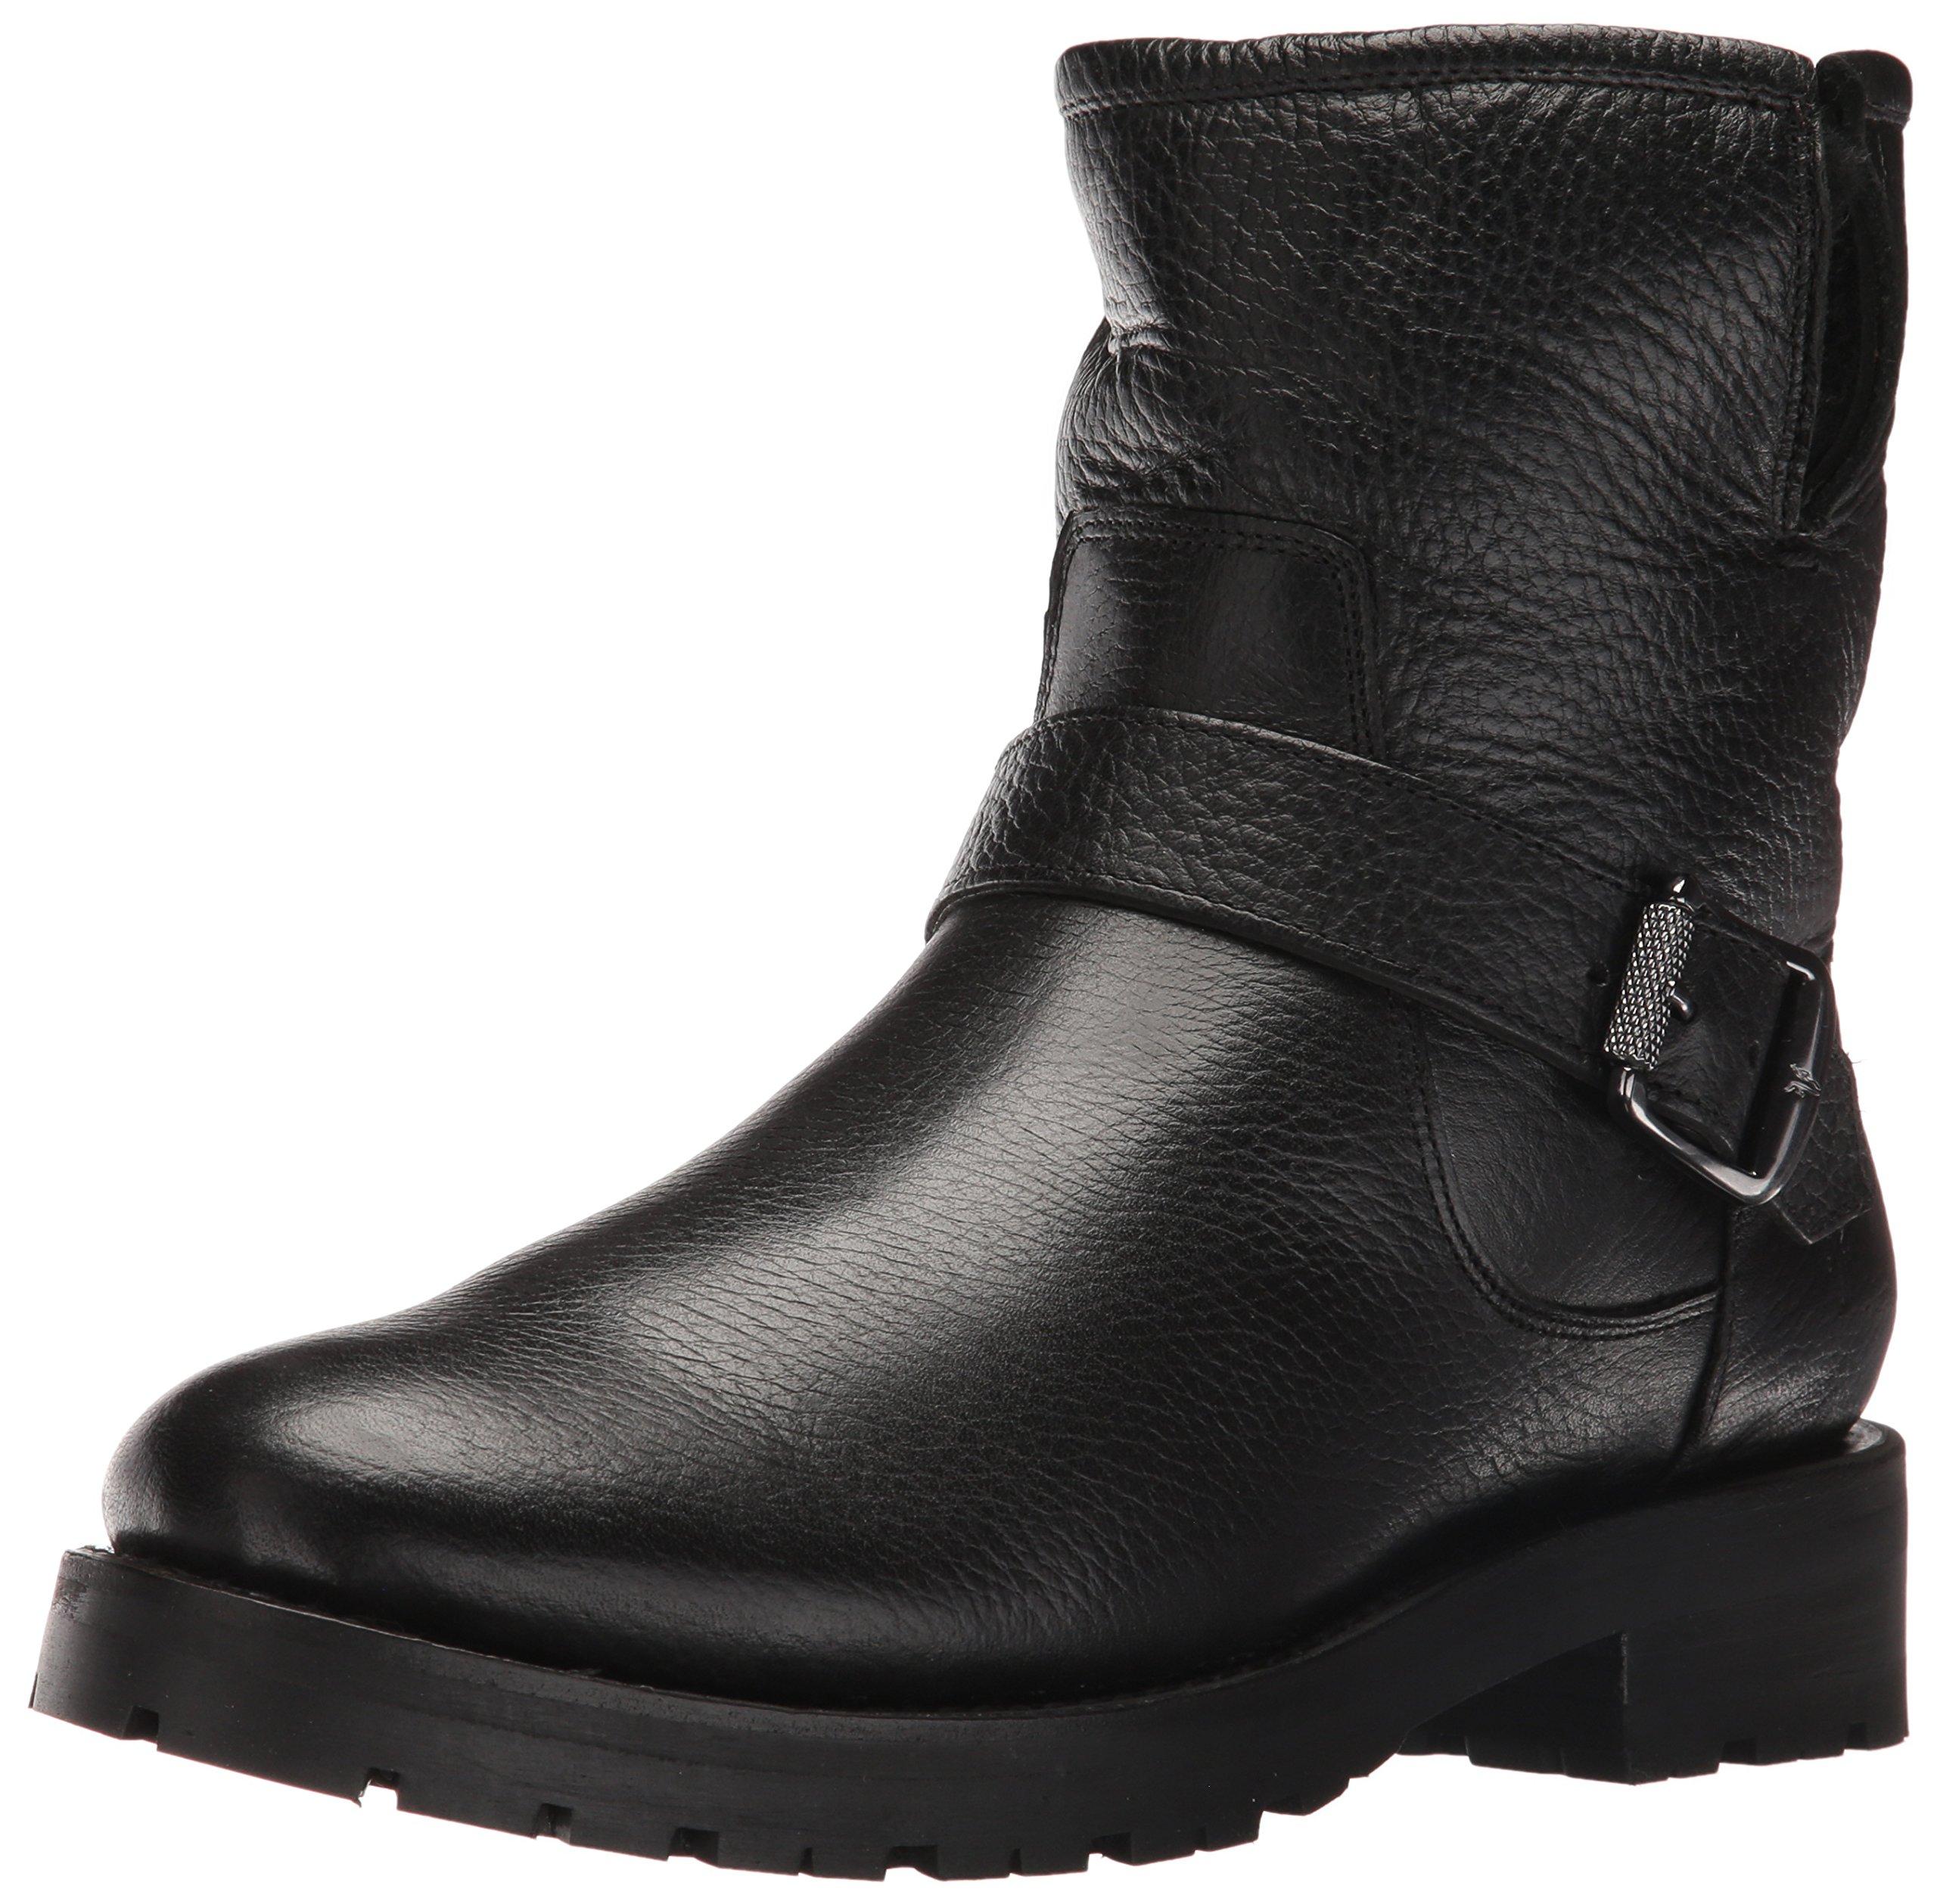 FRYE Women's Natalie Short Engineer Lug Shearling Winter Boot, Black, 8.5 M US